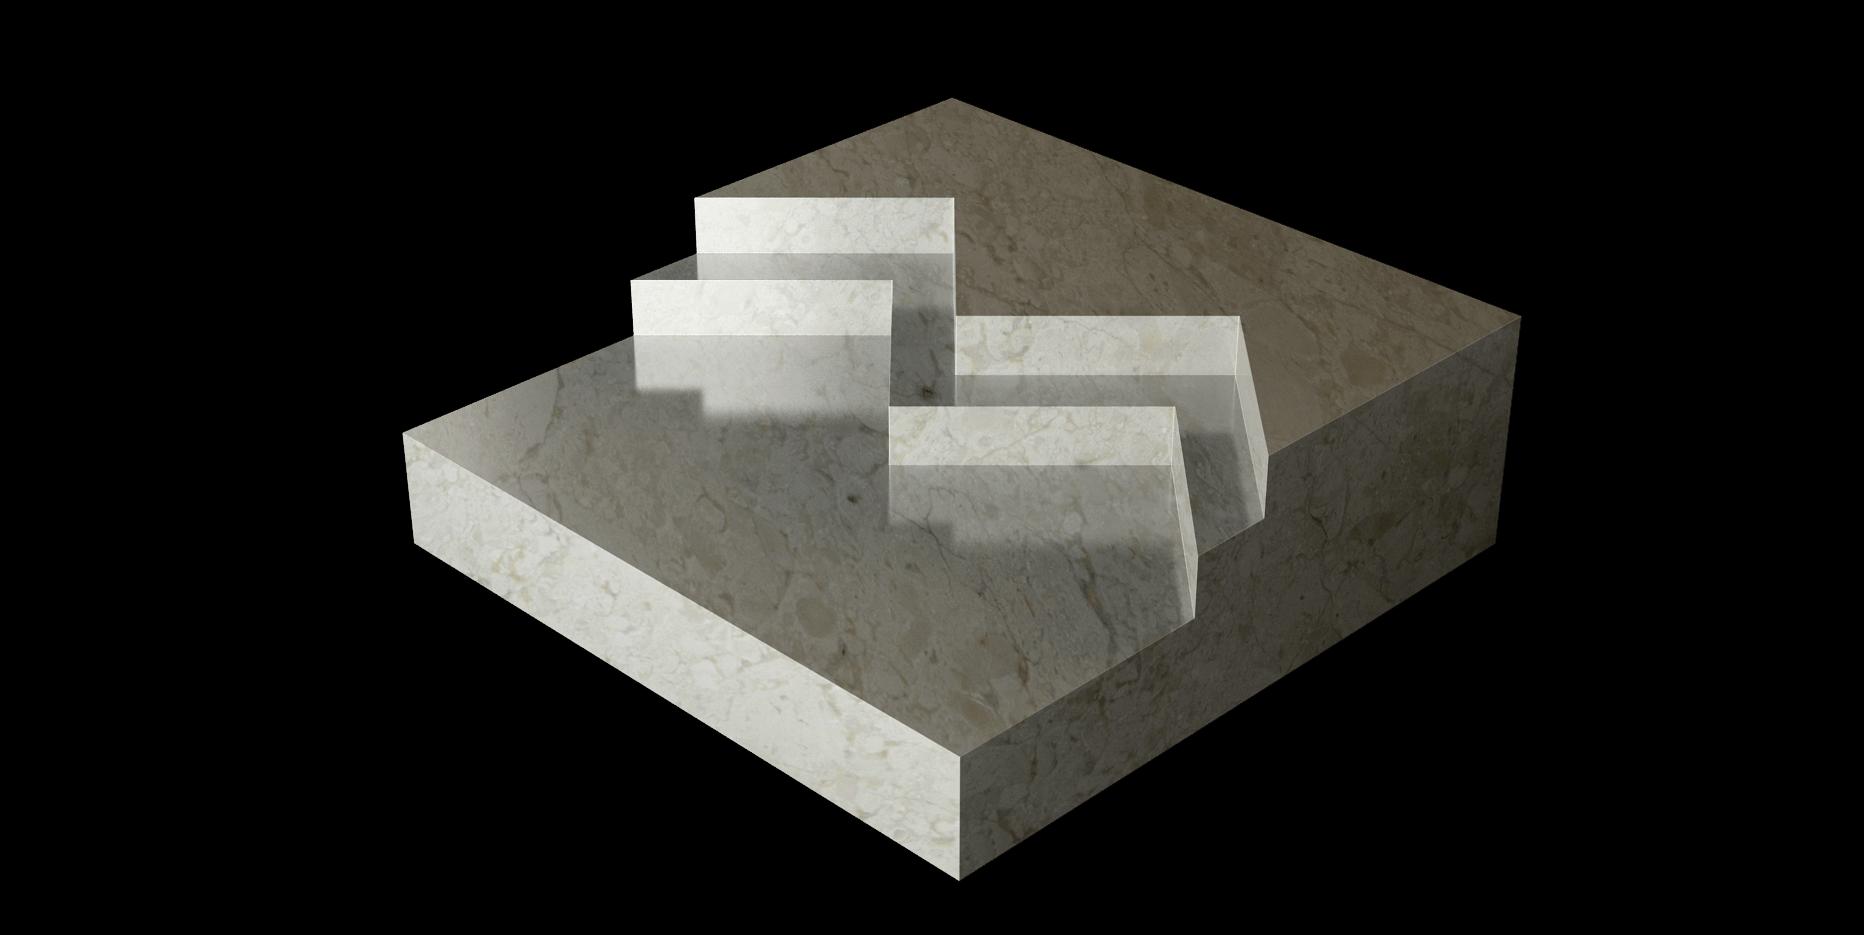 Crema Nova фото 2 — камень от Bevers Marmyr